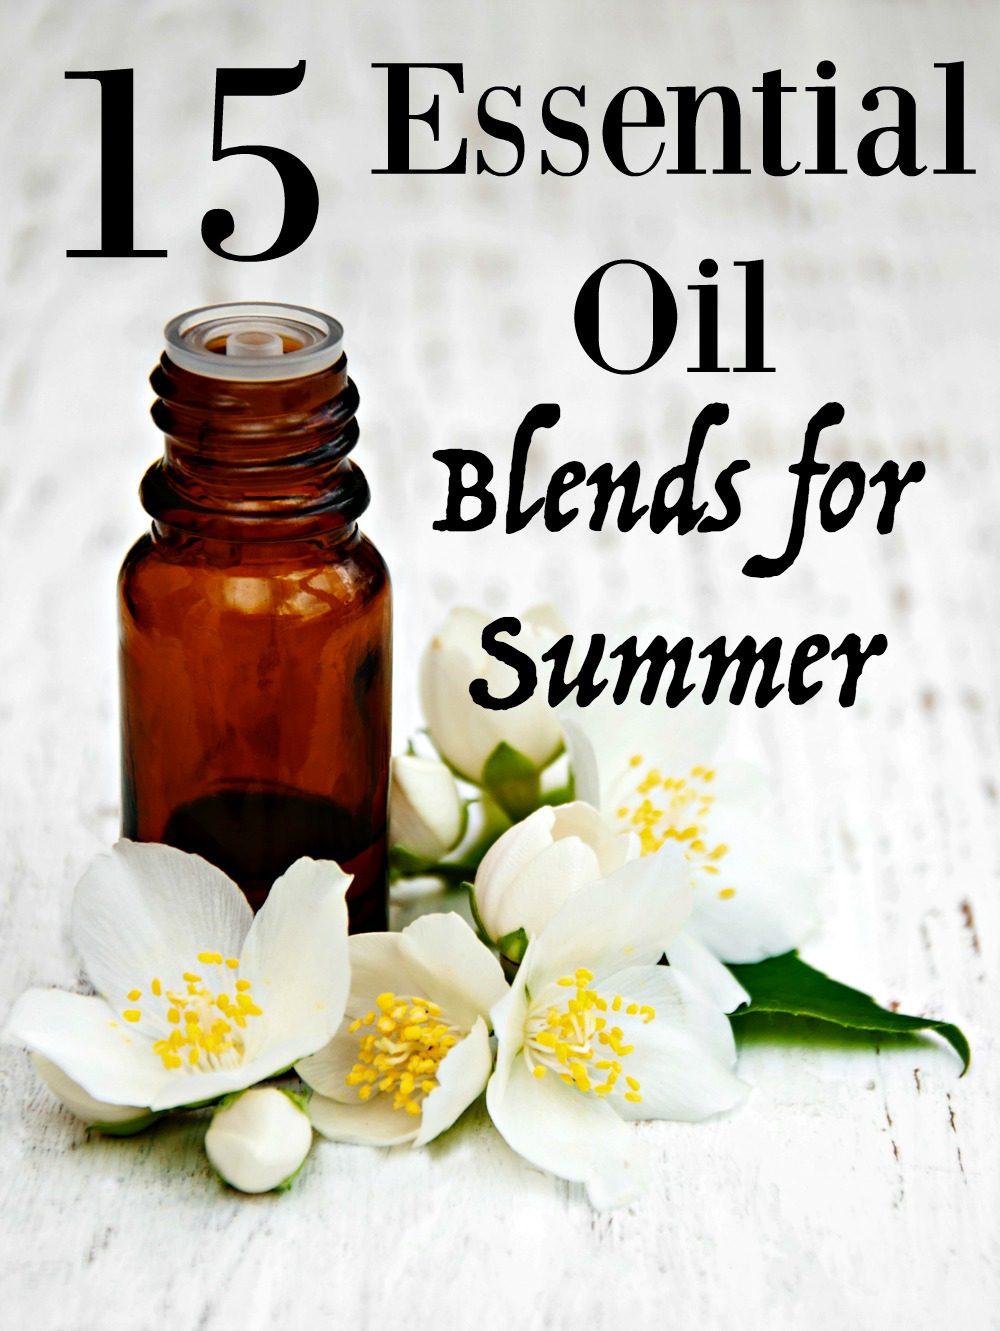 15 Essentials Oil Blends for Summer